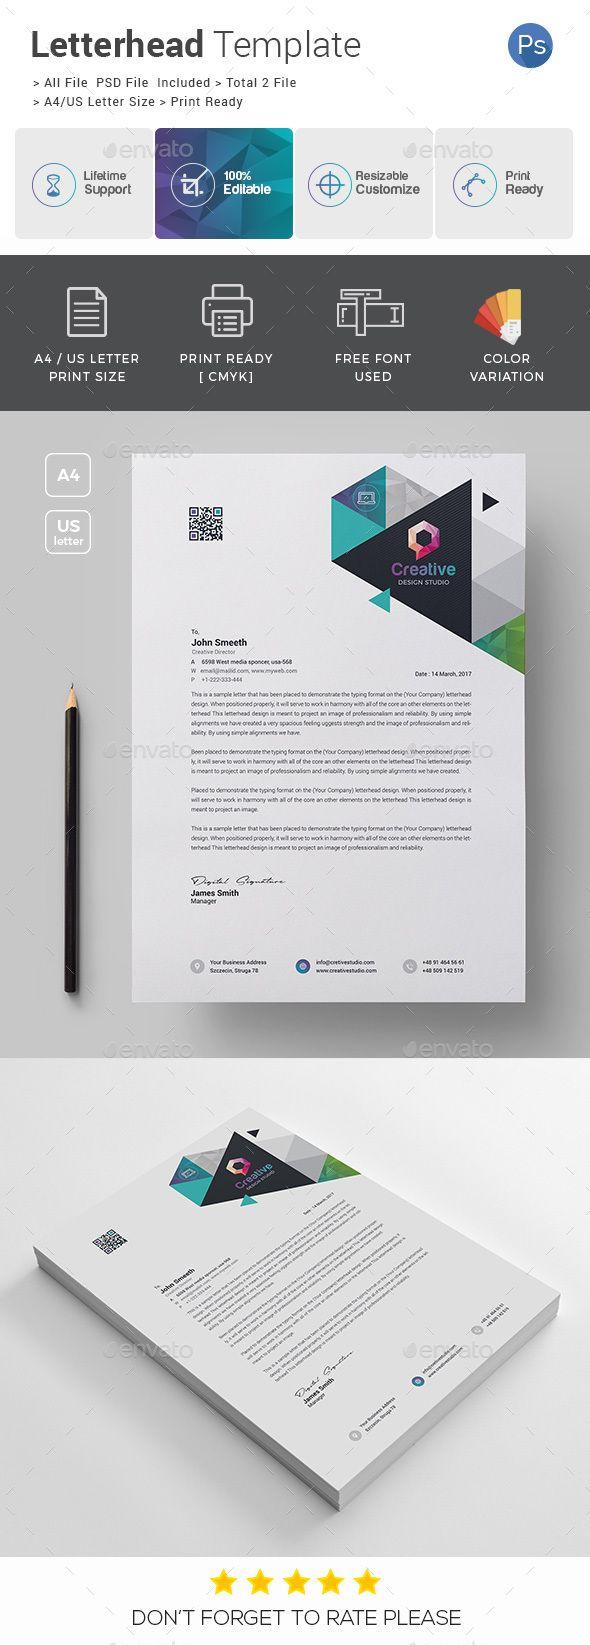 Letterhead Template PSD 833 best Letterhead Design